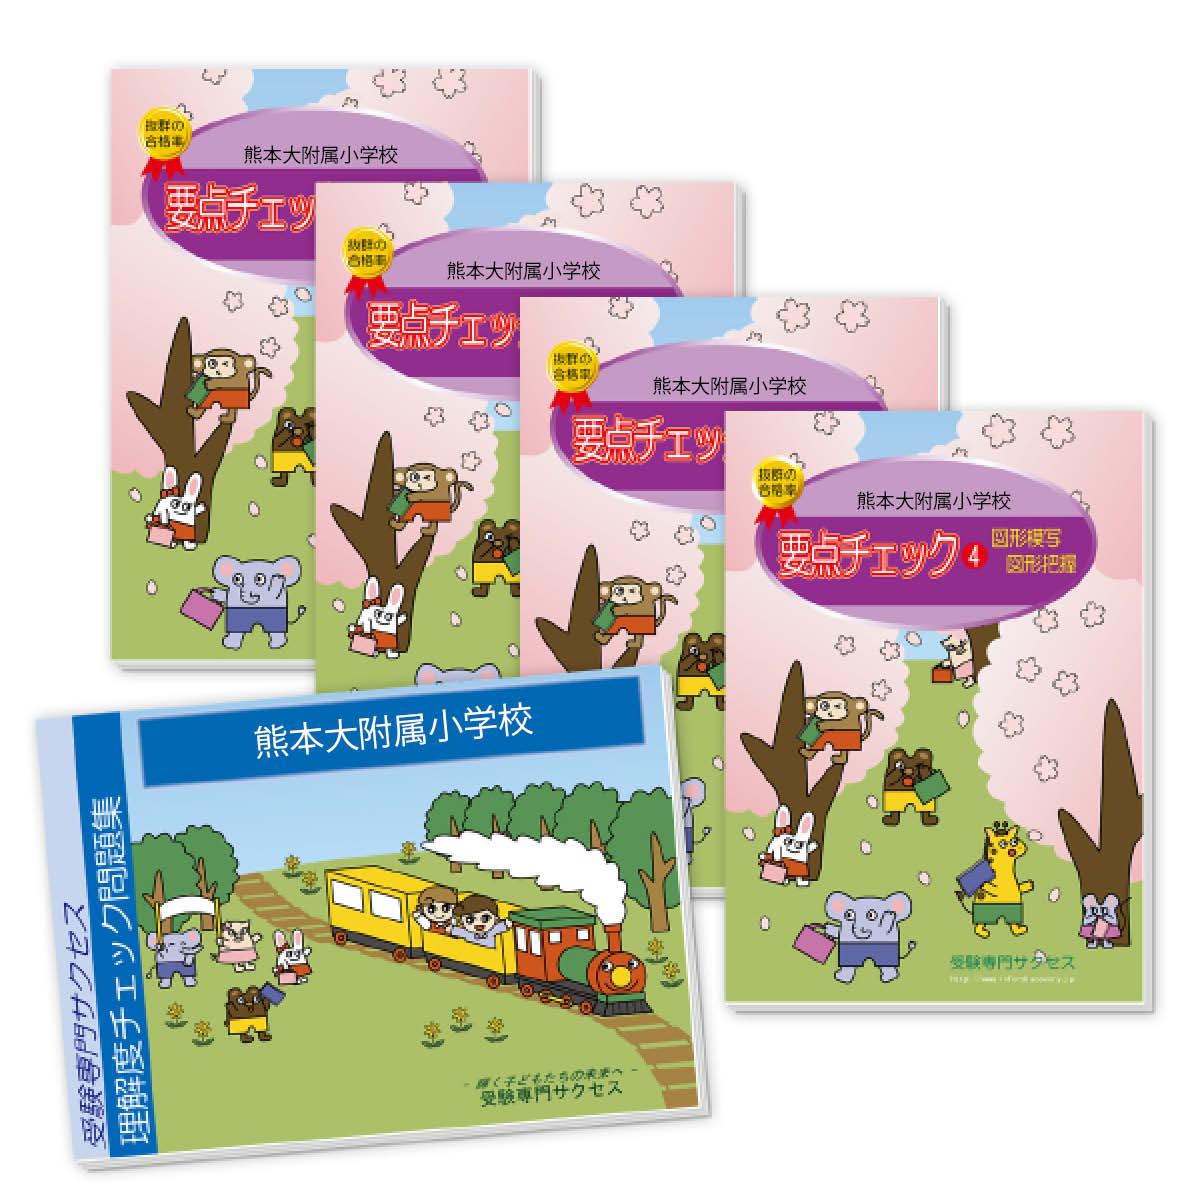 【送料・代引手数料無料】熊本大附属小学校・分野別要点チェック問題集